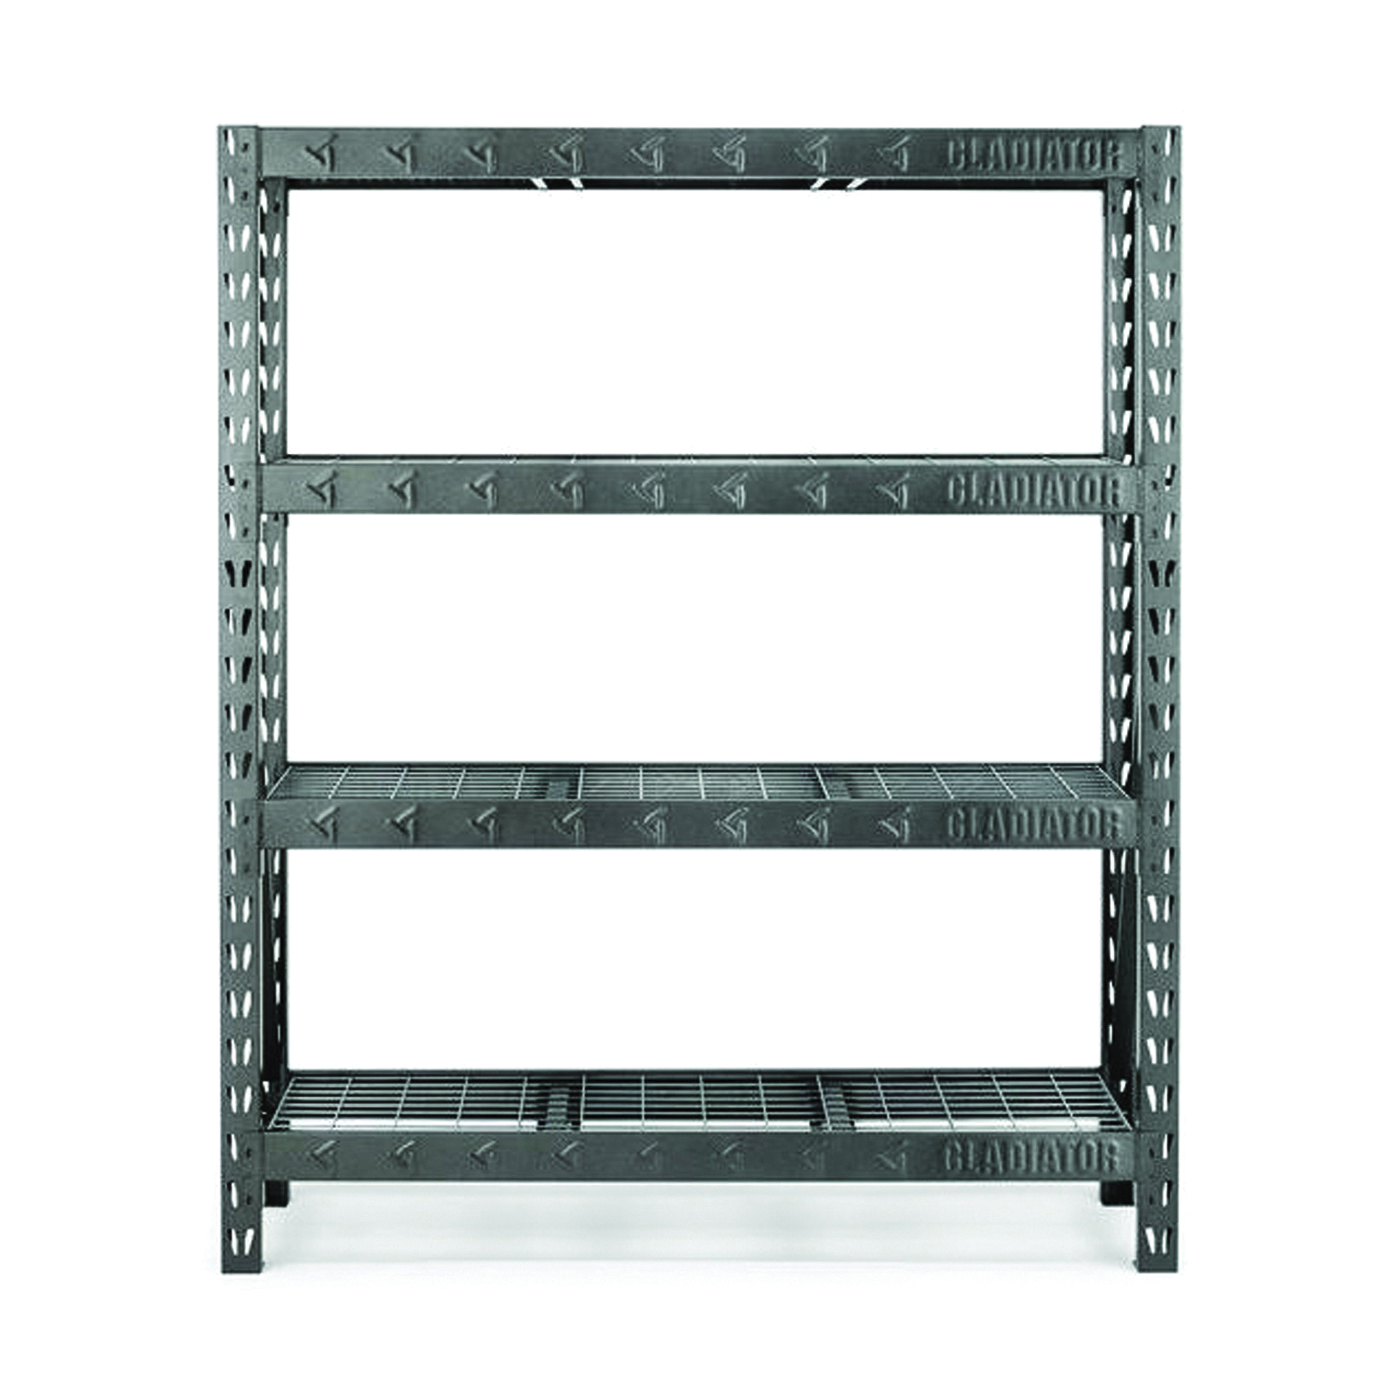 Picture of GLADIATOR GARS604TEG Rack Shelf, 7200 lb Capacity, 4-Shelf, 60 in OAW, 18 in OAD, 72 in OAH, Hammered Granite